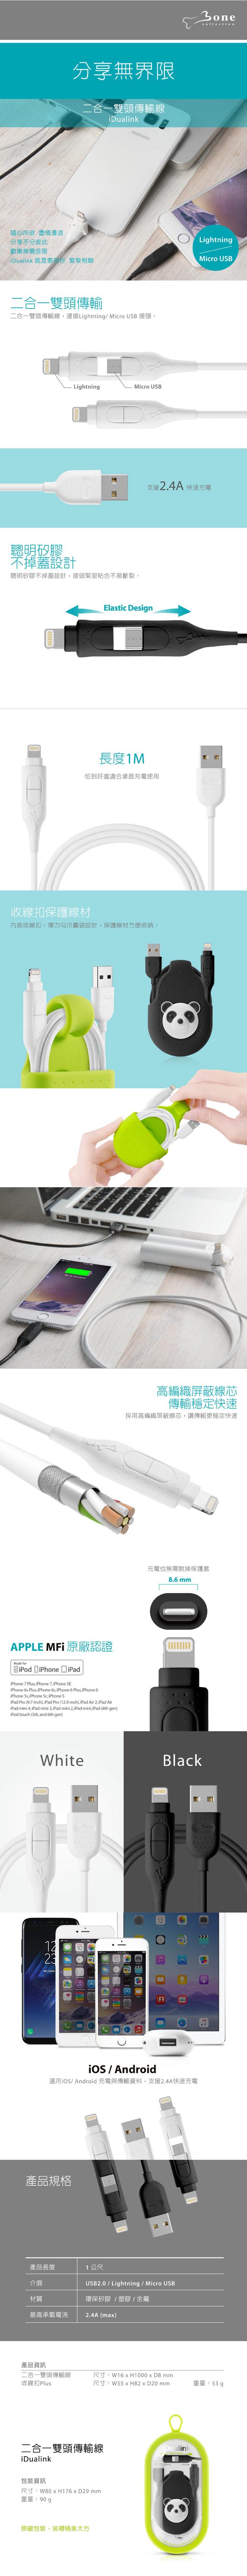 (複製)Bone|二合一雙頭傳輸線 - 鴨子  充電線 兩用線 Android APPLE官方認證 iPhone